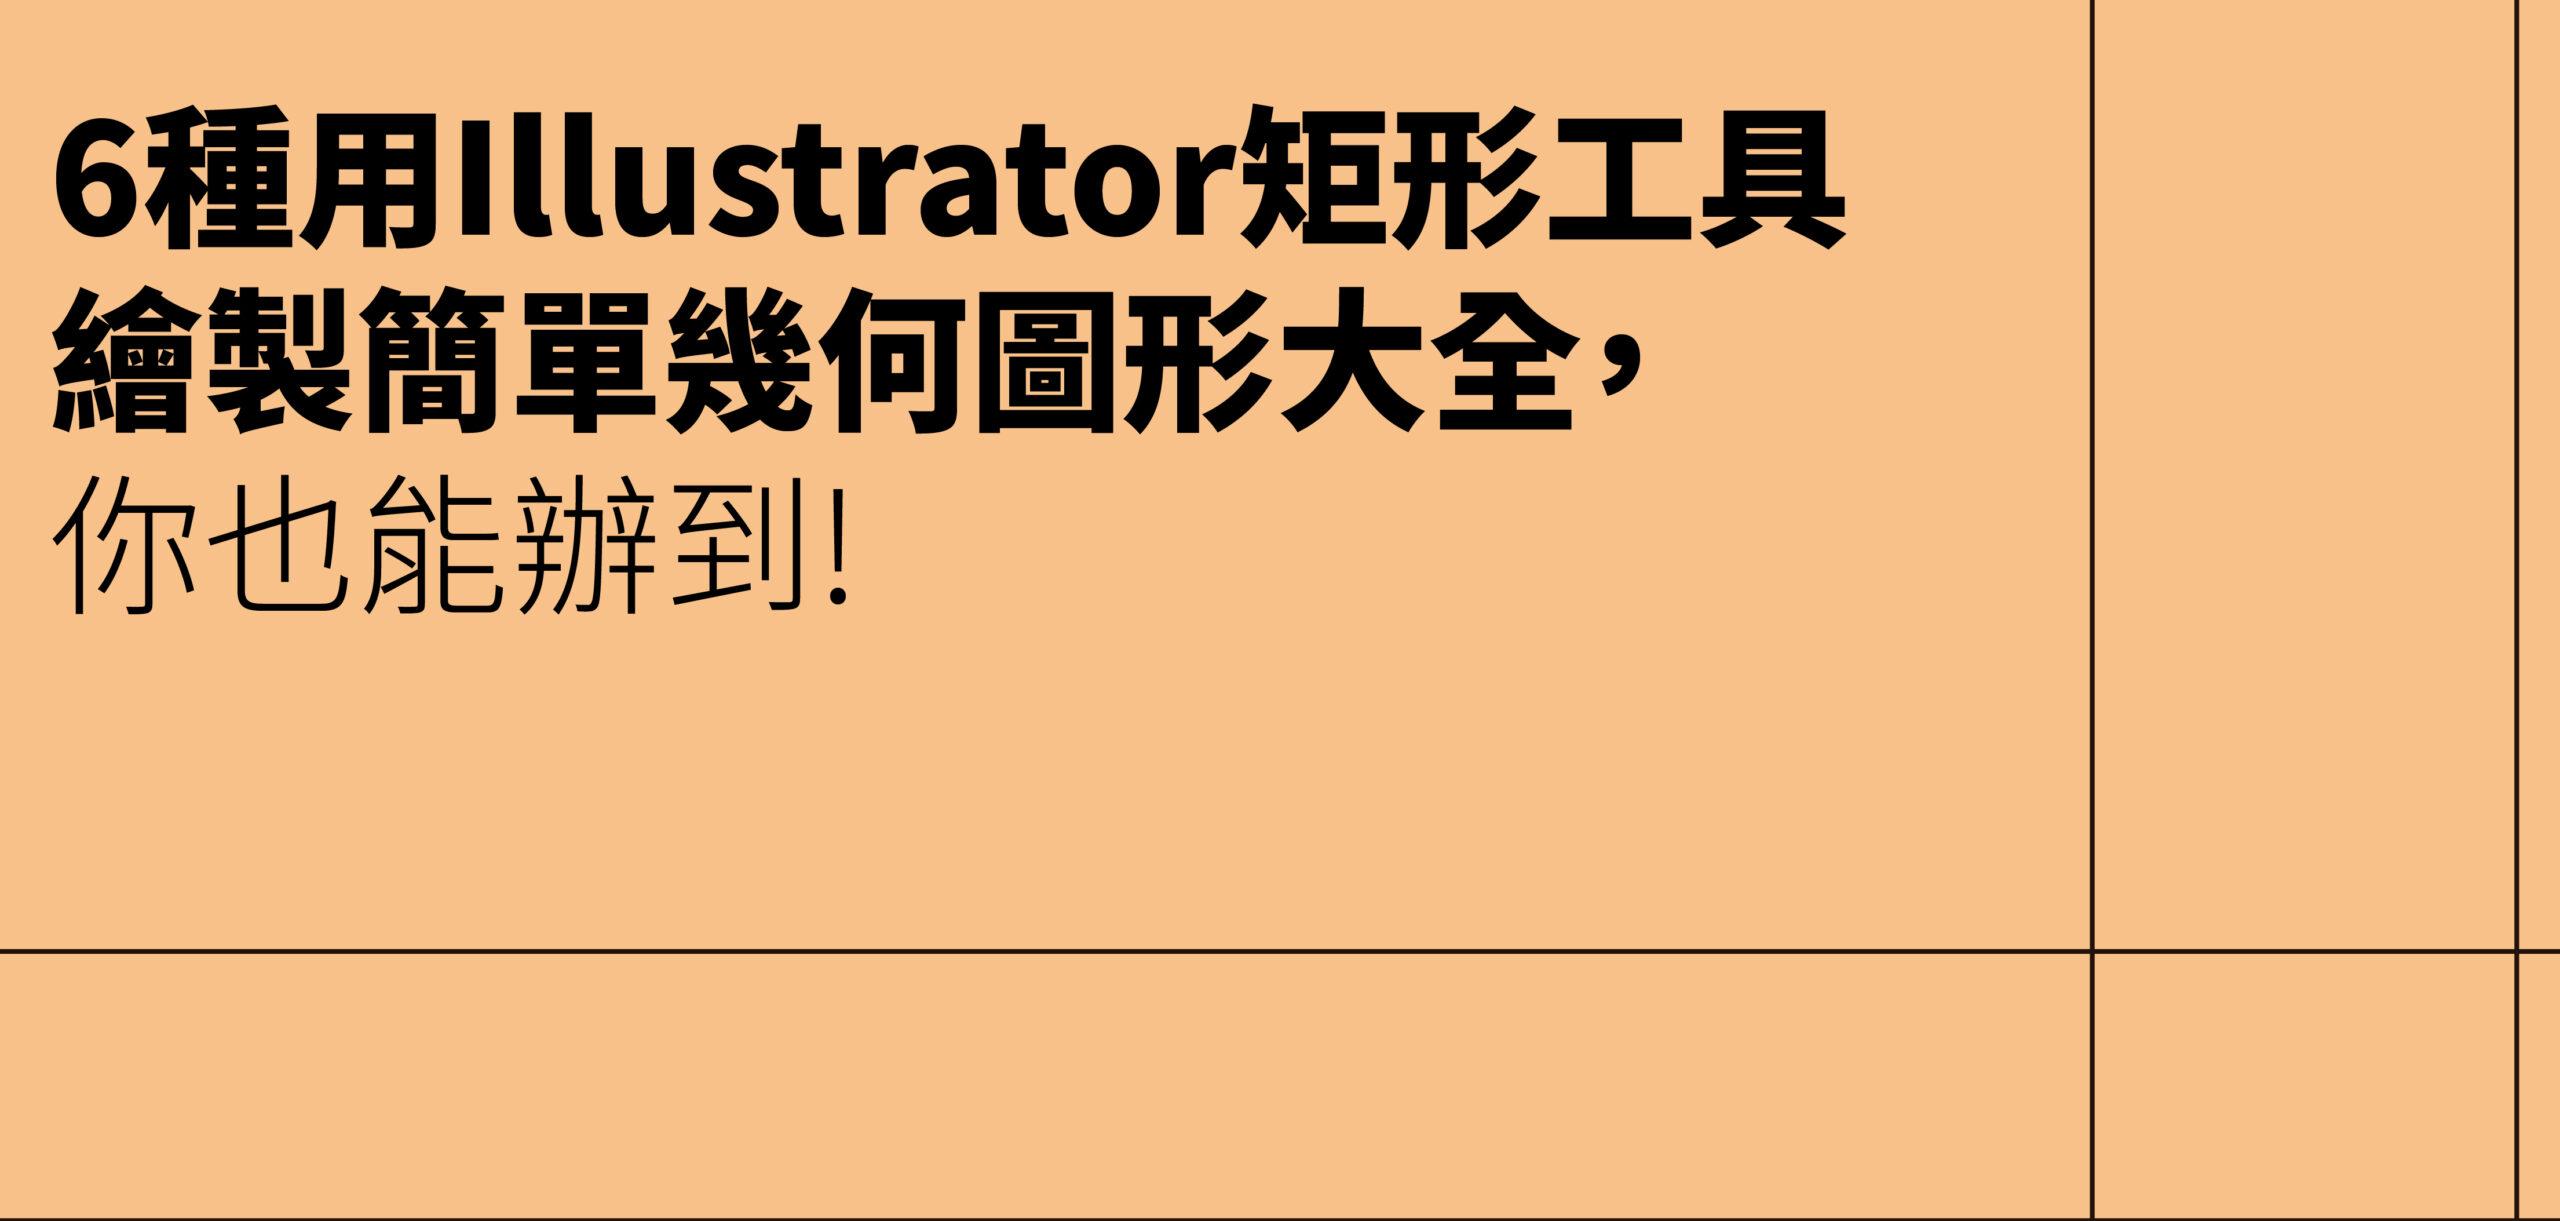 Illustrator 矩形工具